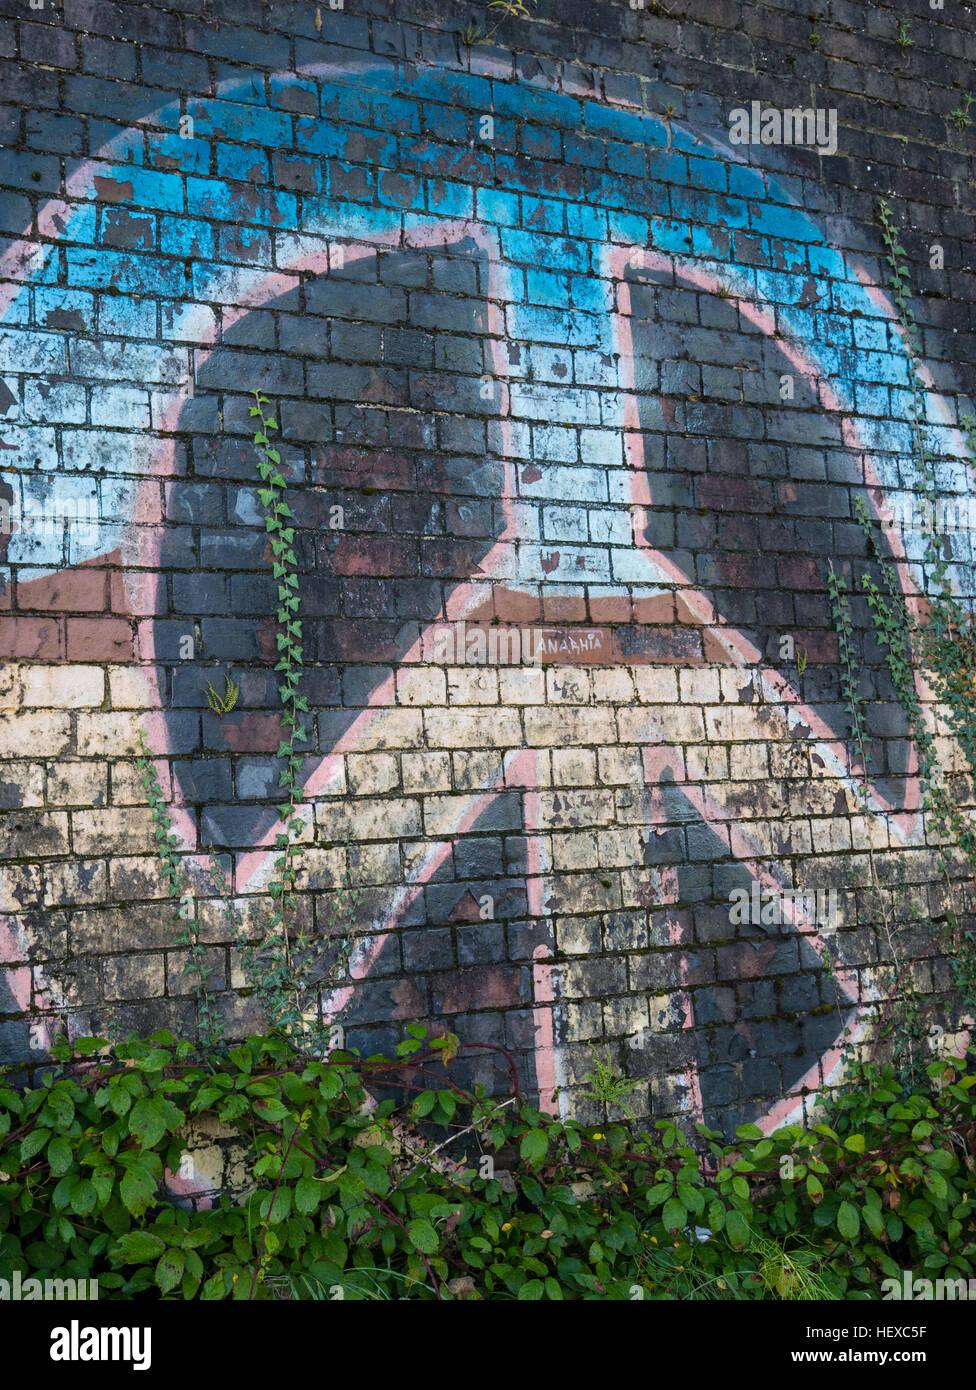 CND simbolo di pace, Tilehurst, Reading, in Inghilterra Immagini Stock